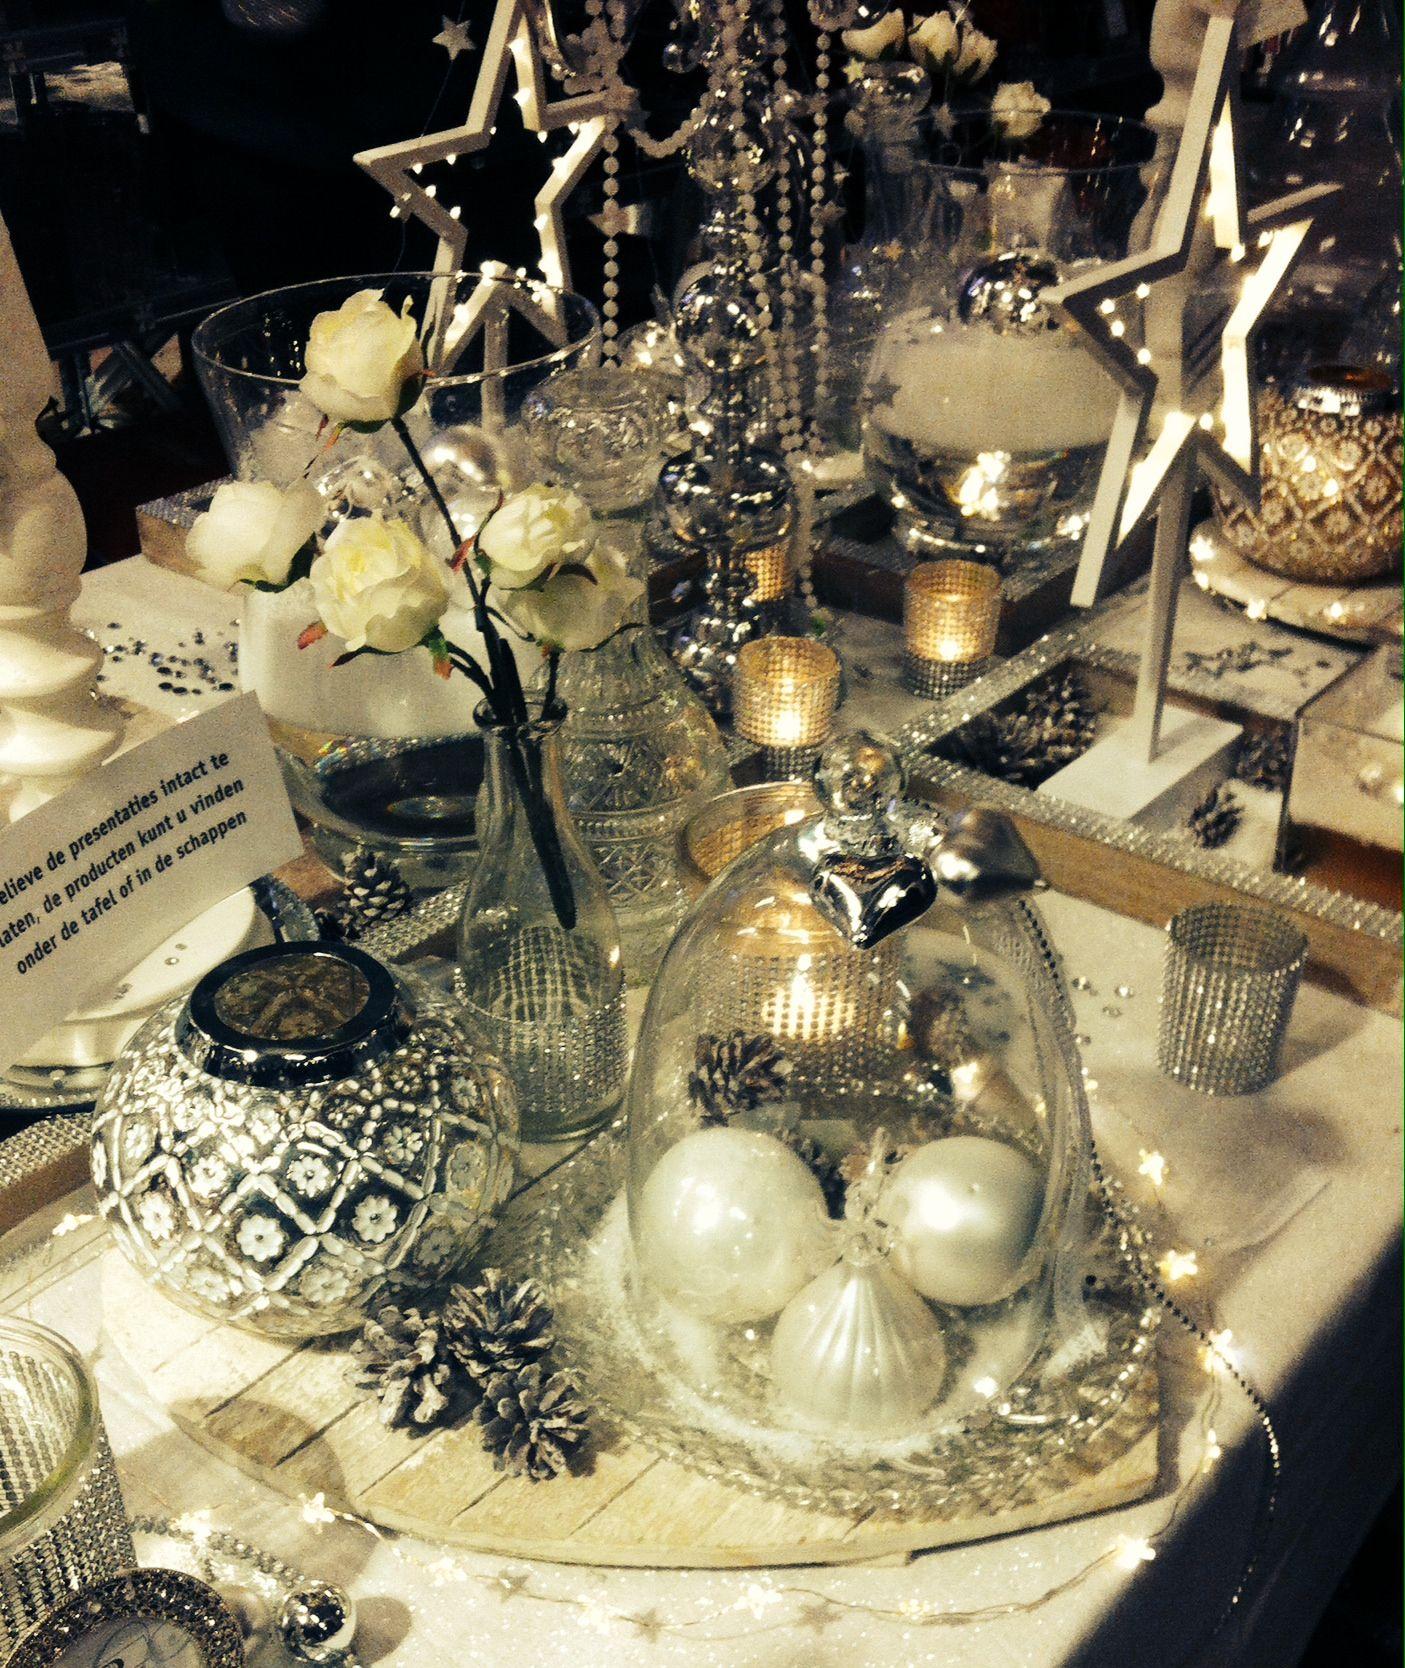 Christmas table decorations winter wonderland intratuin for Intratuin ijsselstein